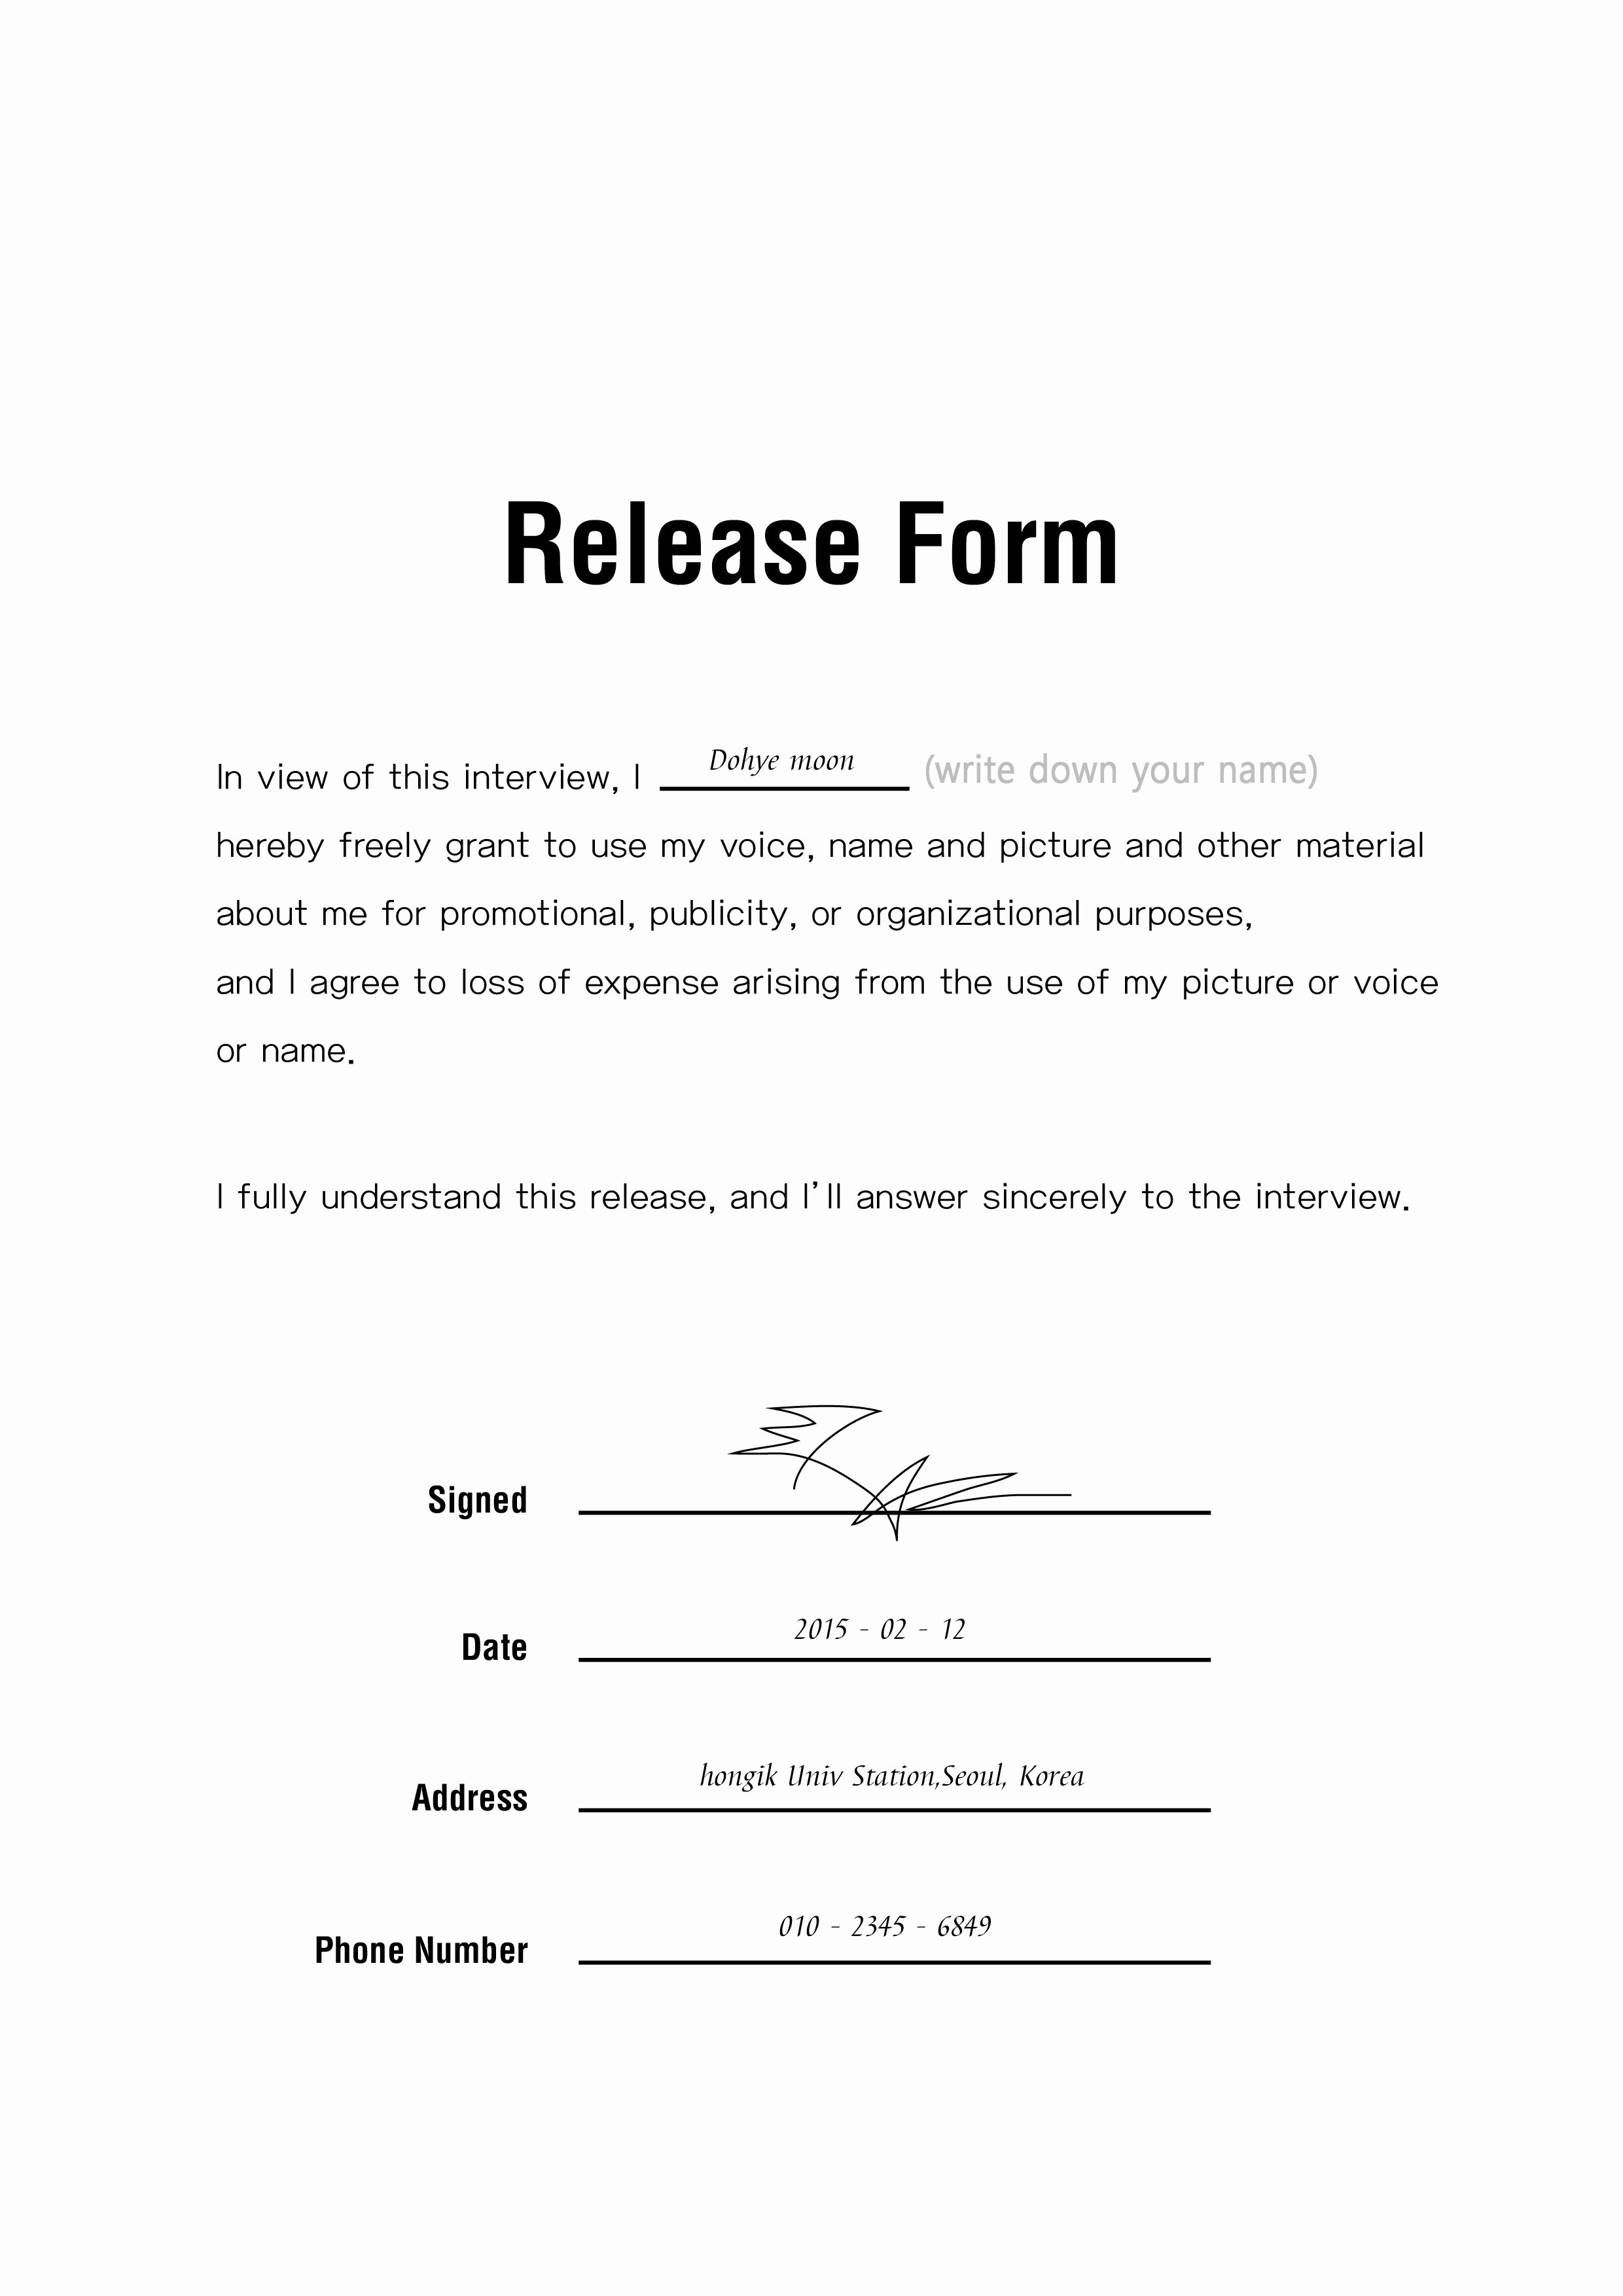 Image Release form Template Elegant Release form